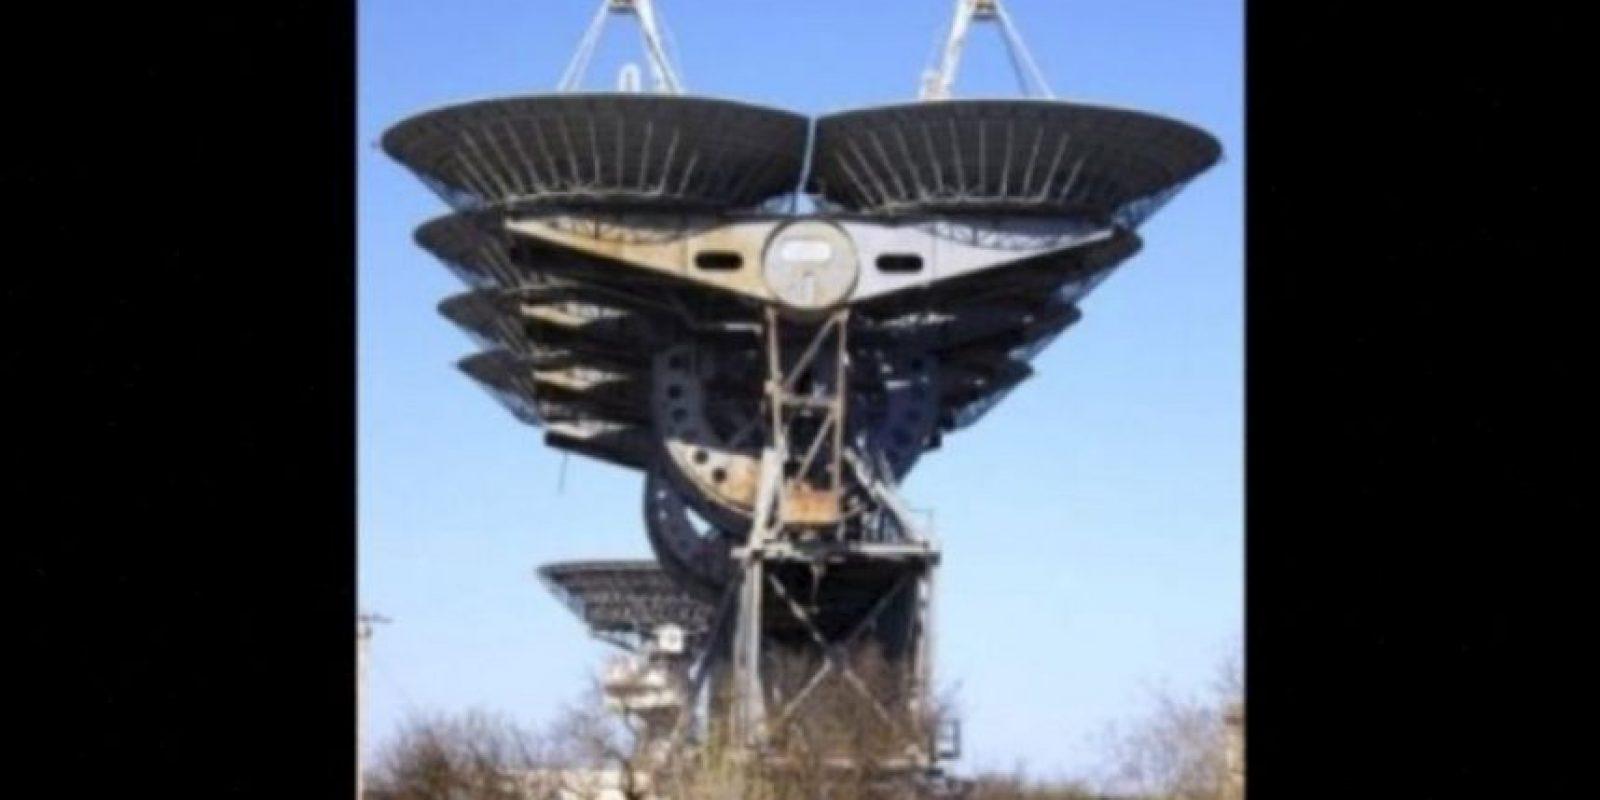 En 1999 y 2001 se volvieron a transmitir mensajes Foto:Wikimedia.org